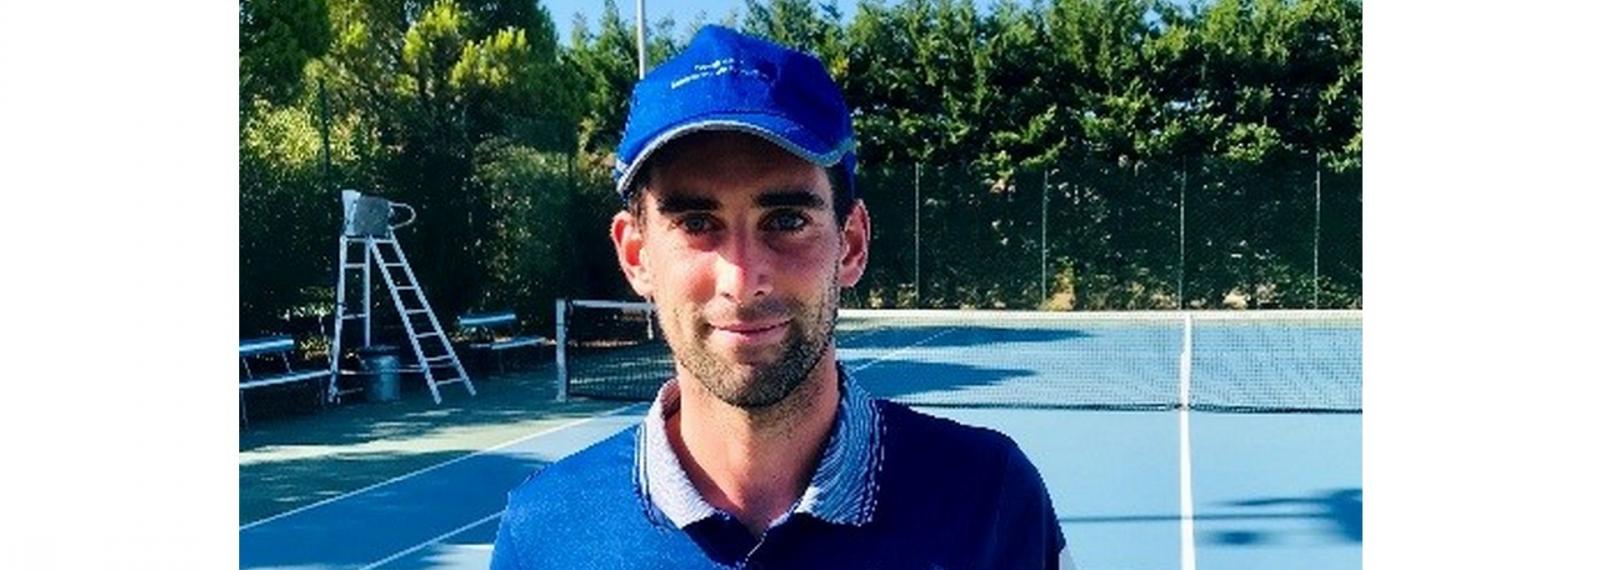 Tennis Club de St-Rémy